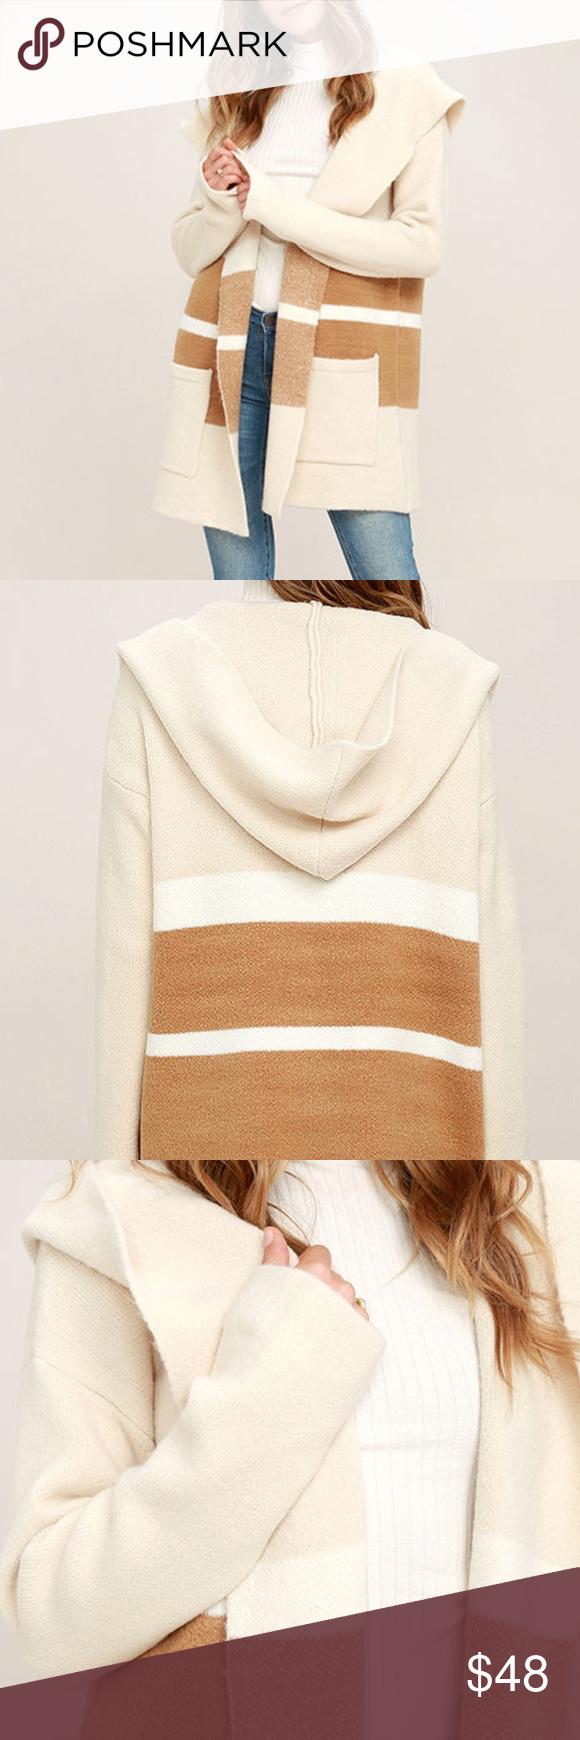 Carlsbad tan and beige hooded cardigan sweater | Hooded cardigan ...